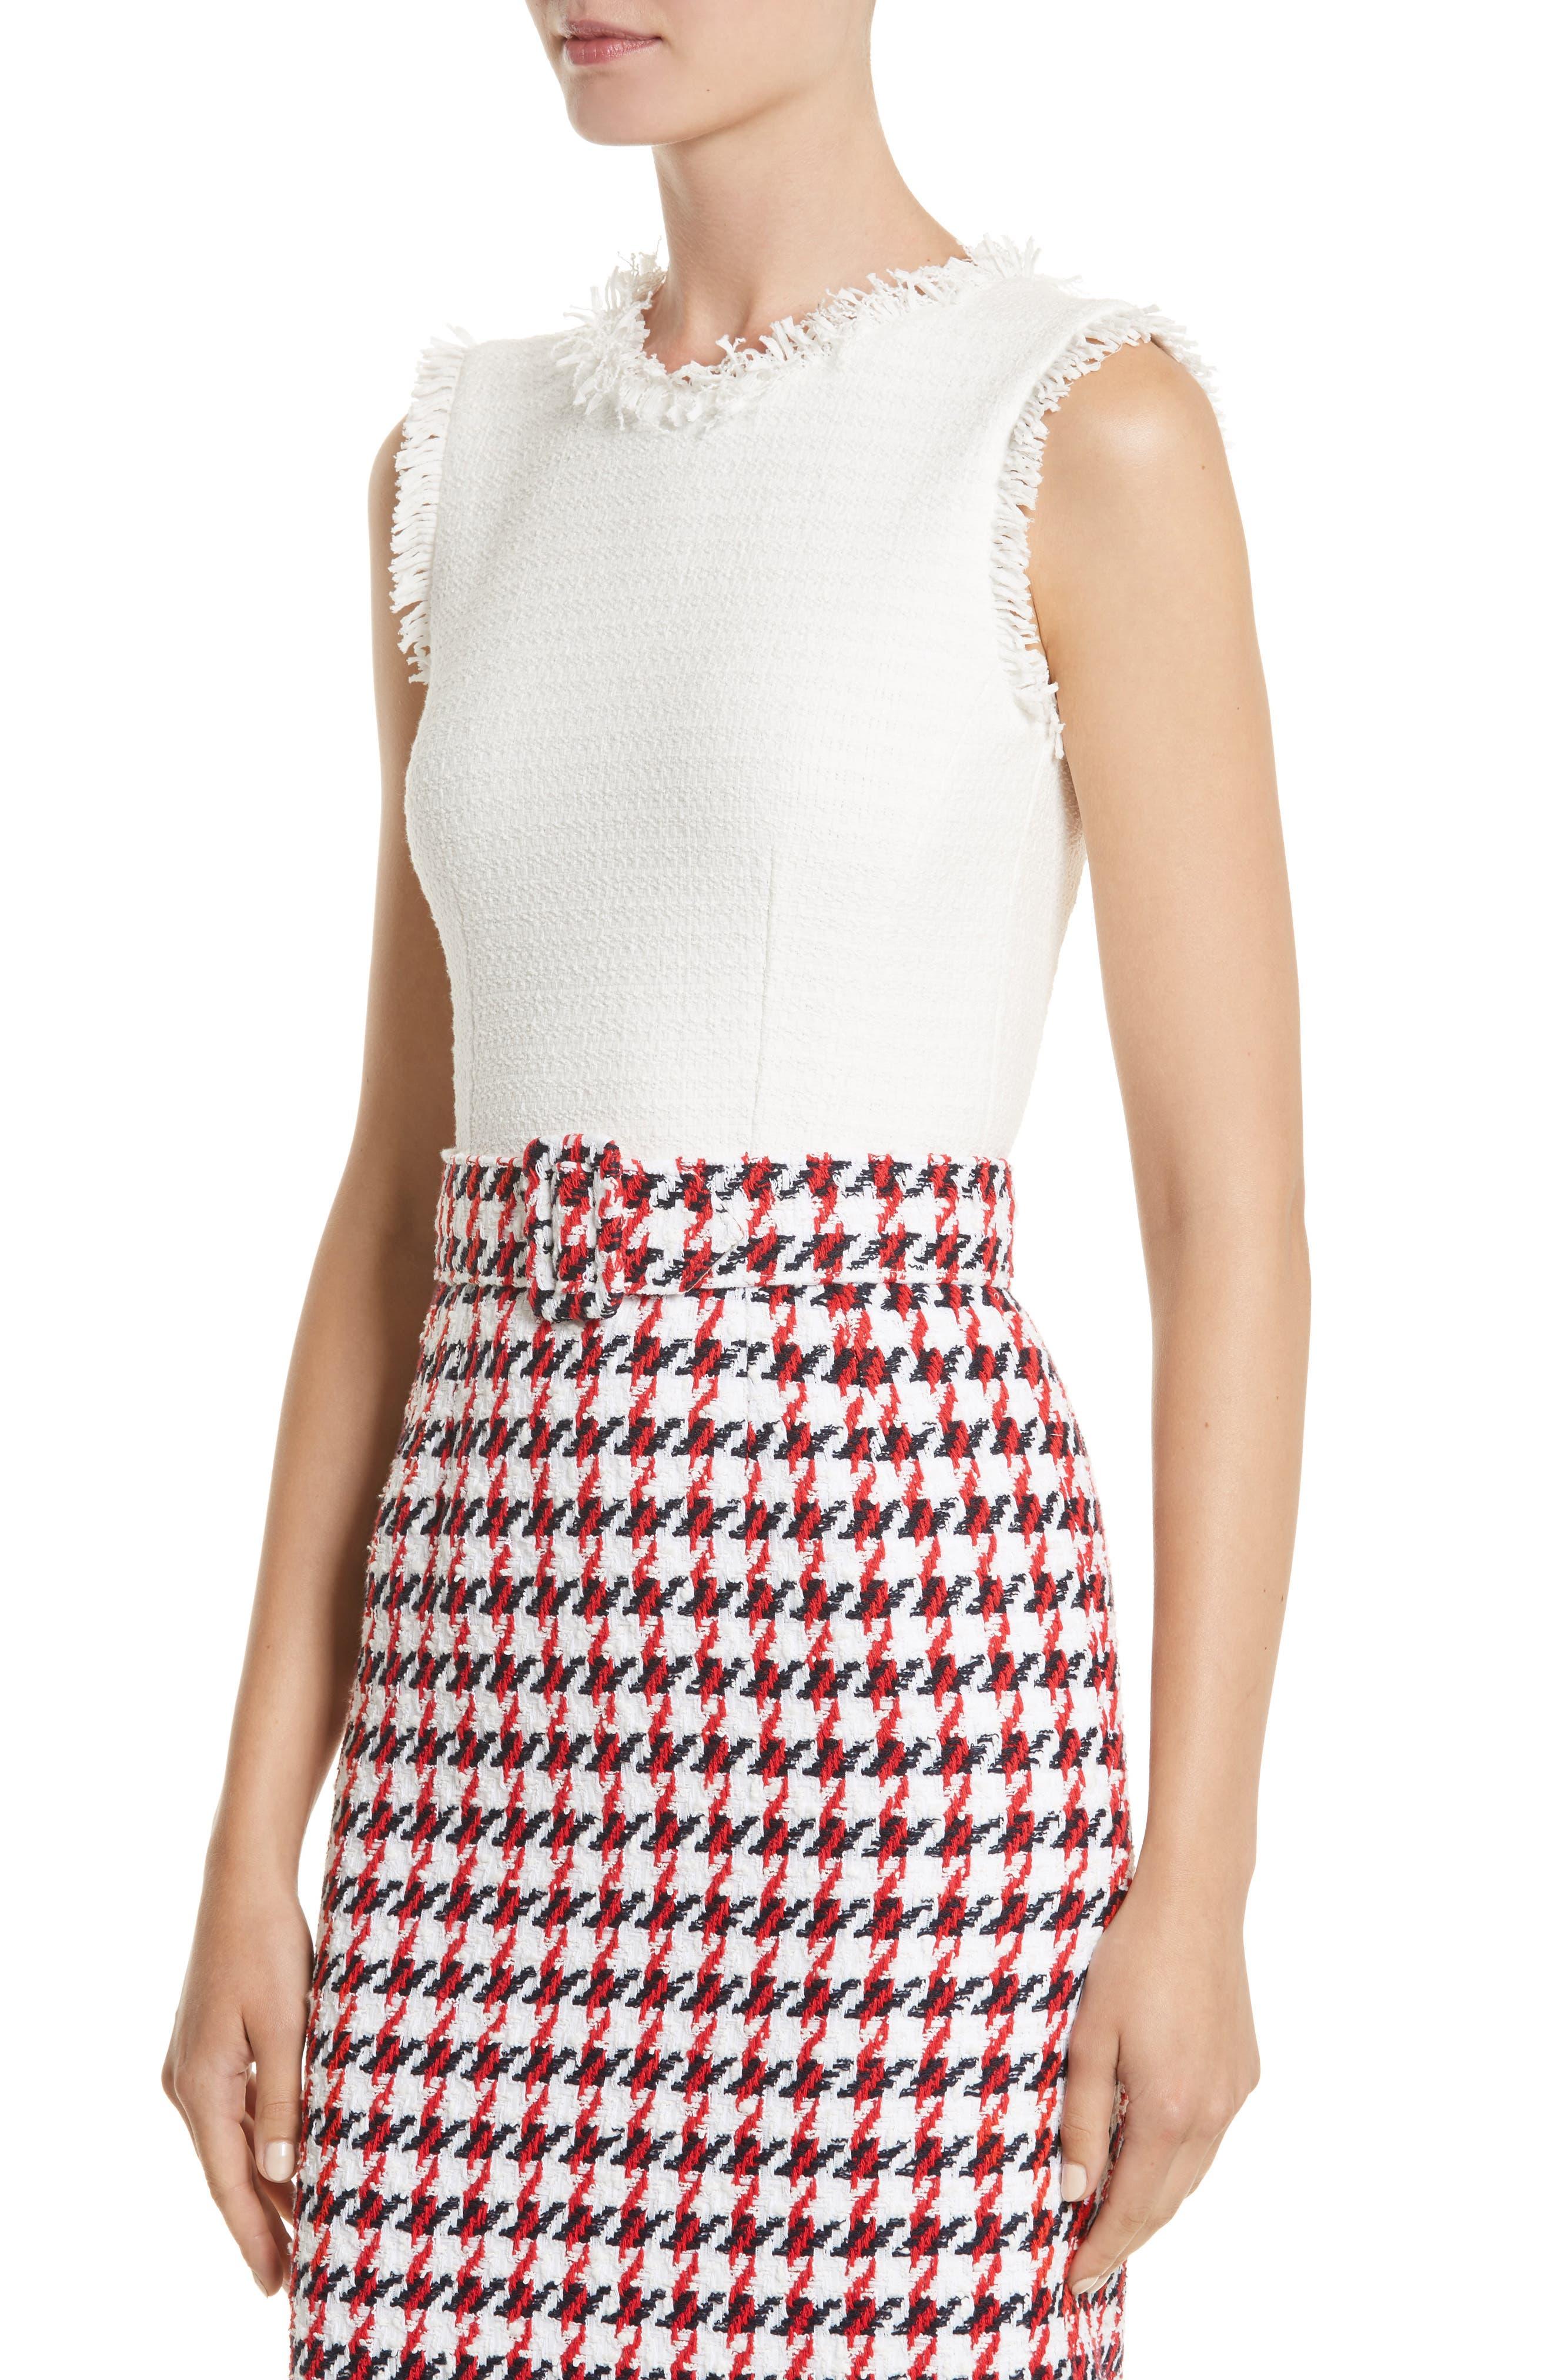 Bicolor Houndstooth Tweed Dress,                             Alternate thumbnail 4, color,                             900